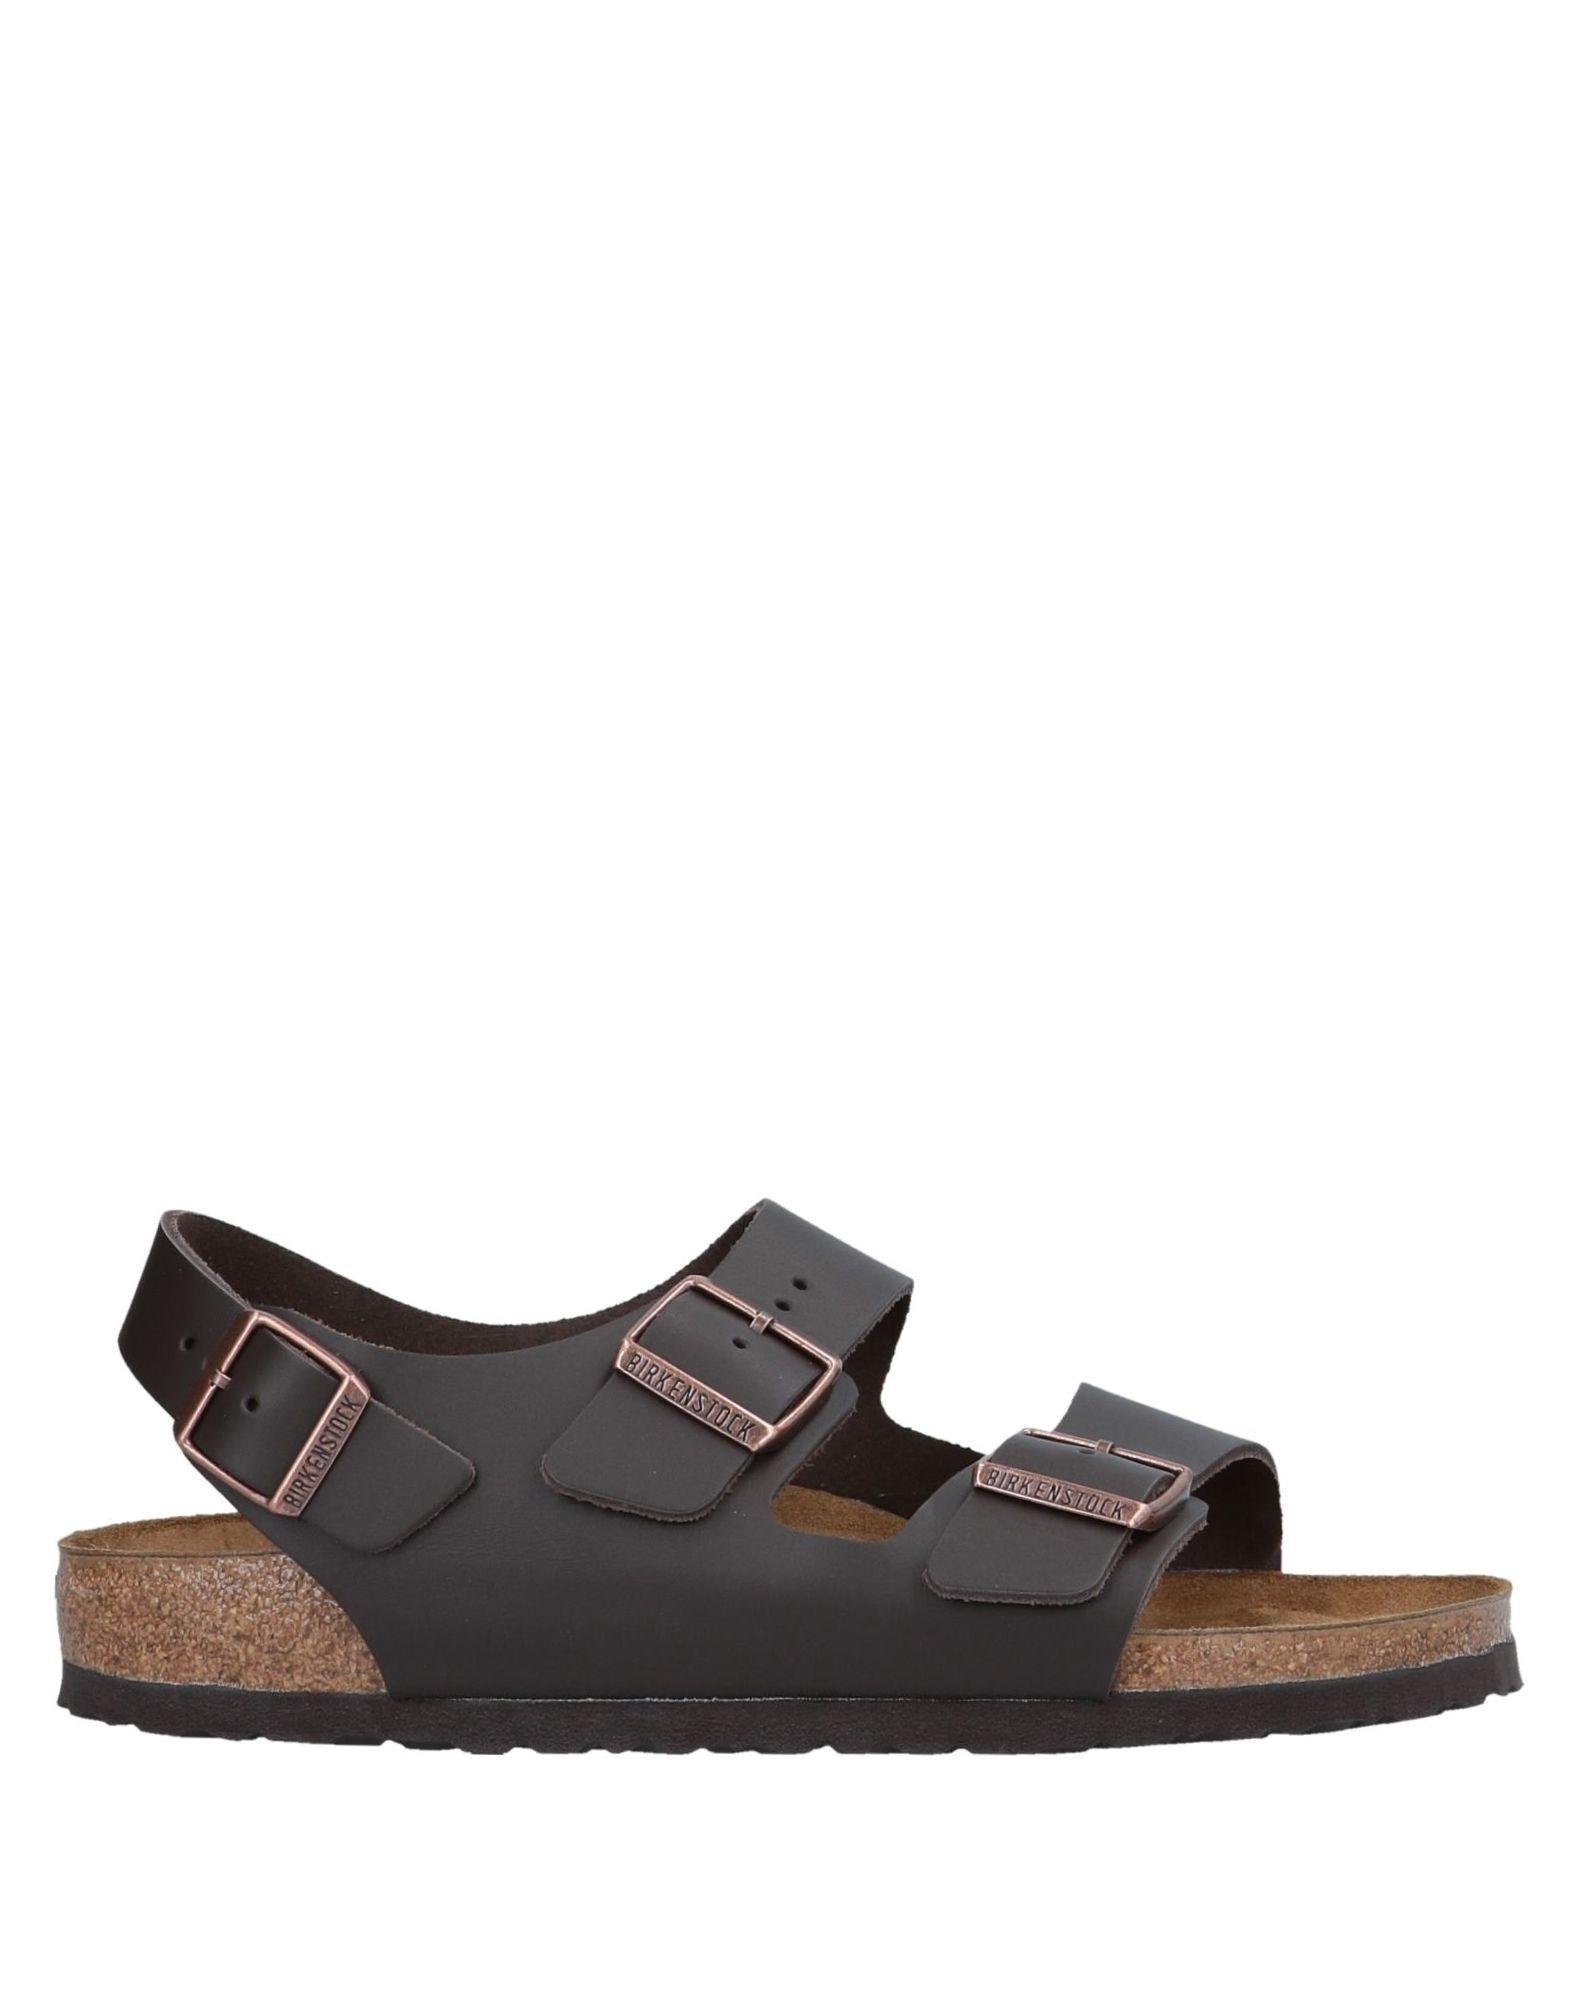 Birkenstock Sandals - Australia Men Birkenstock Sandals online on  Australia - - 11576823FS 512a1b